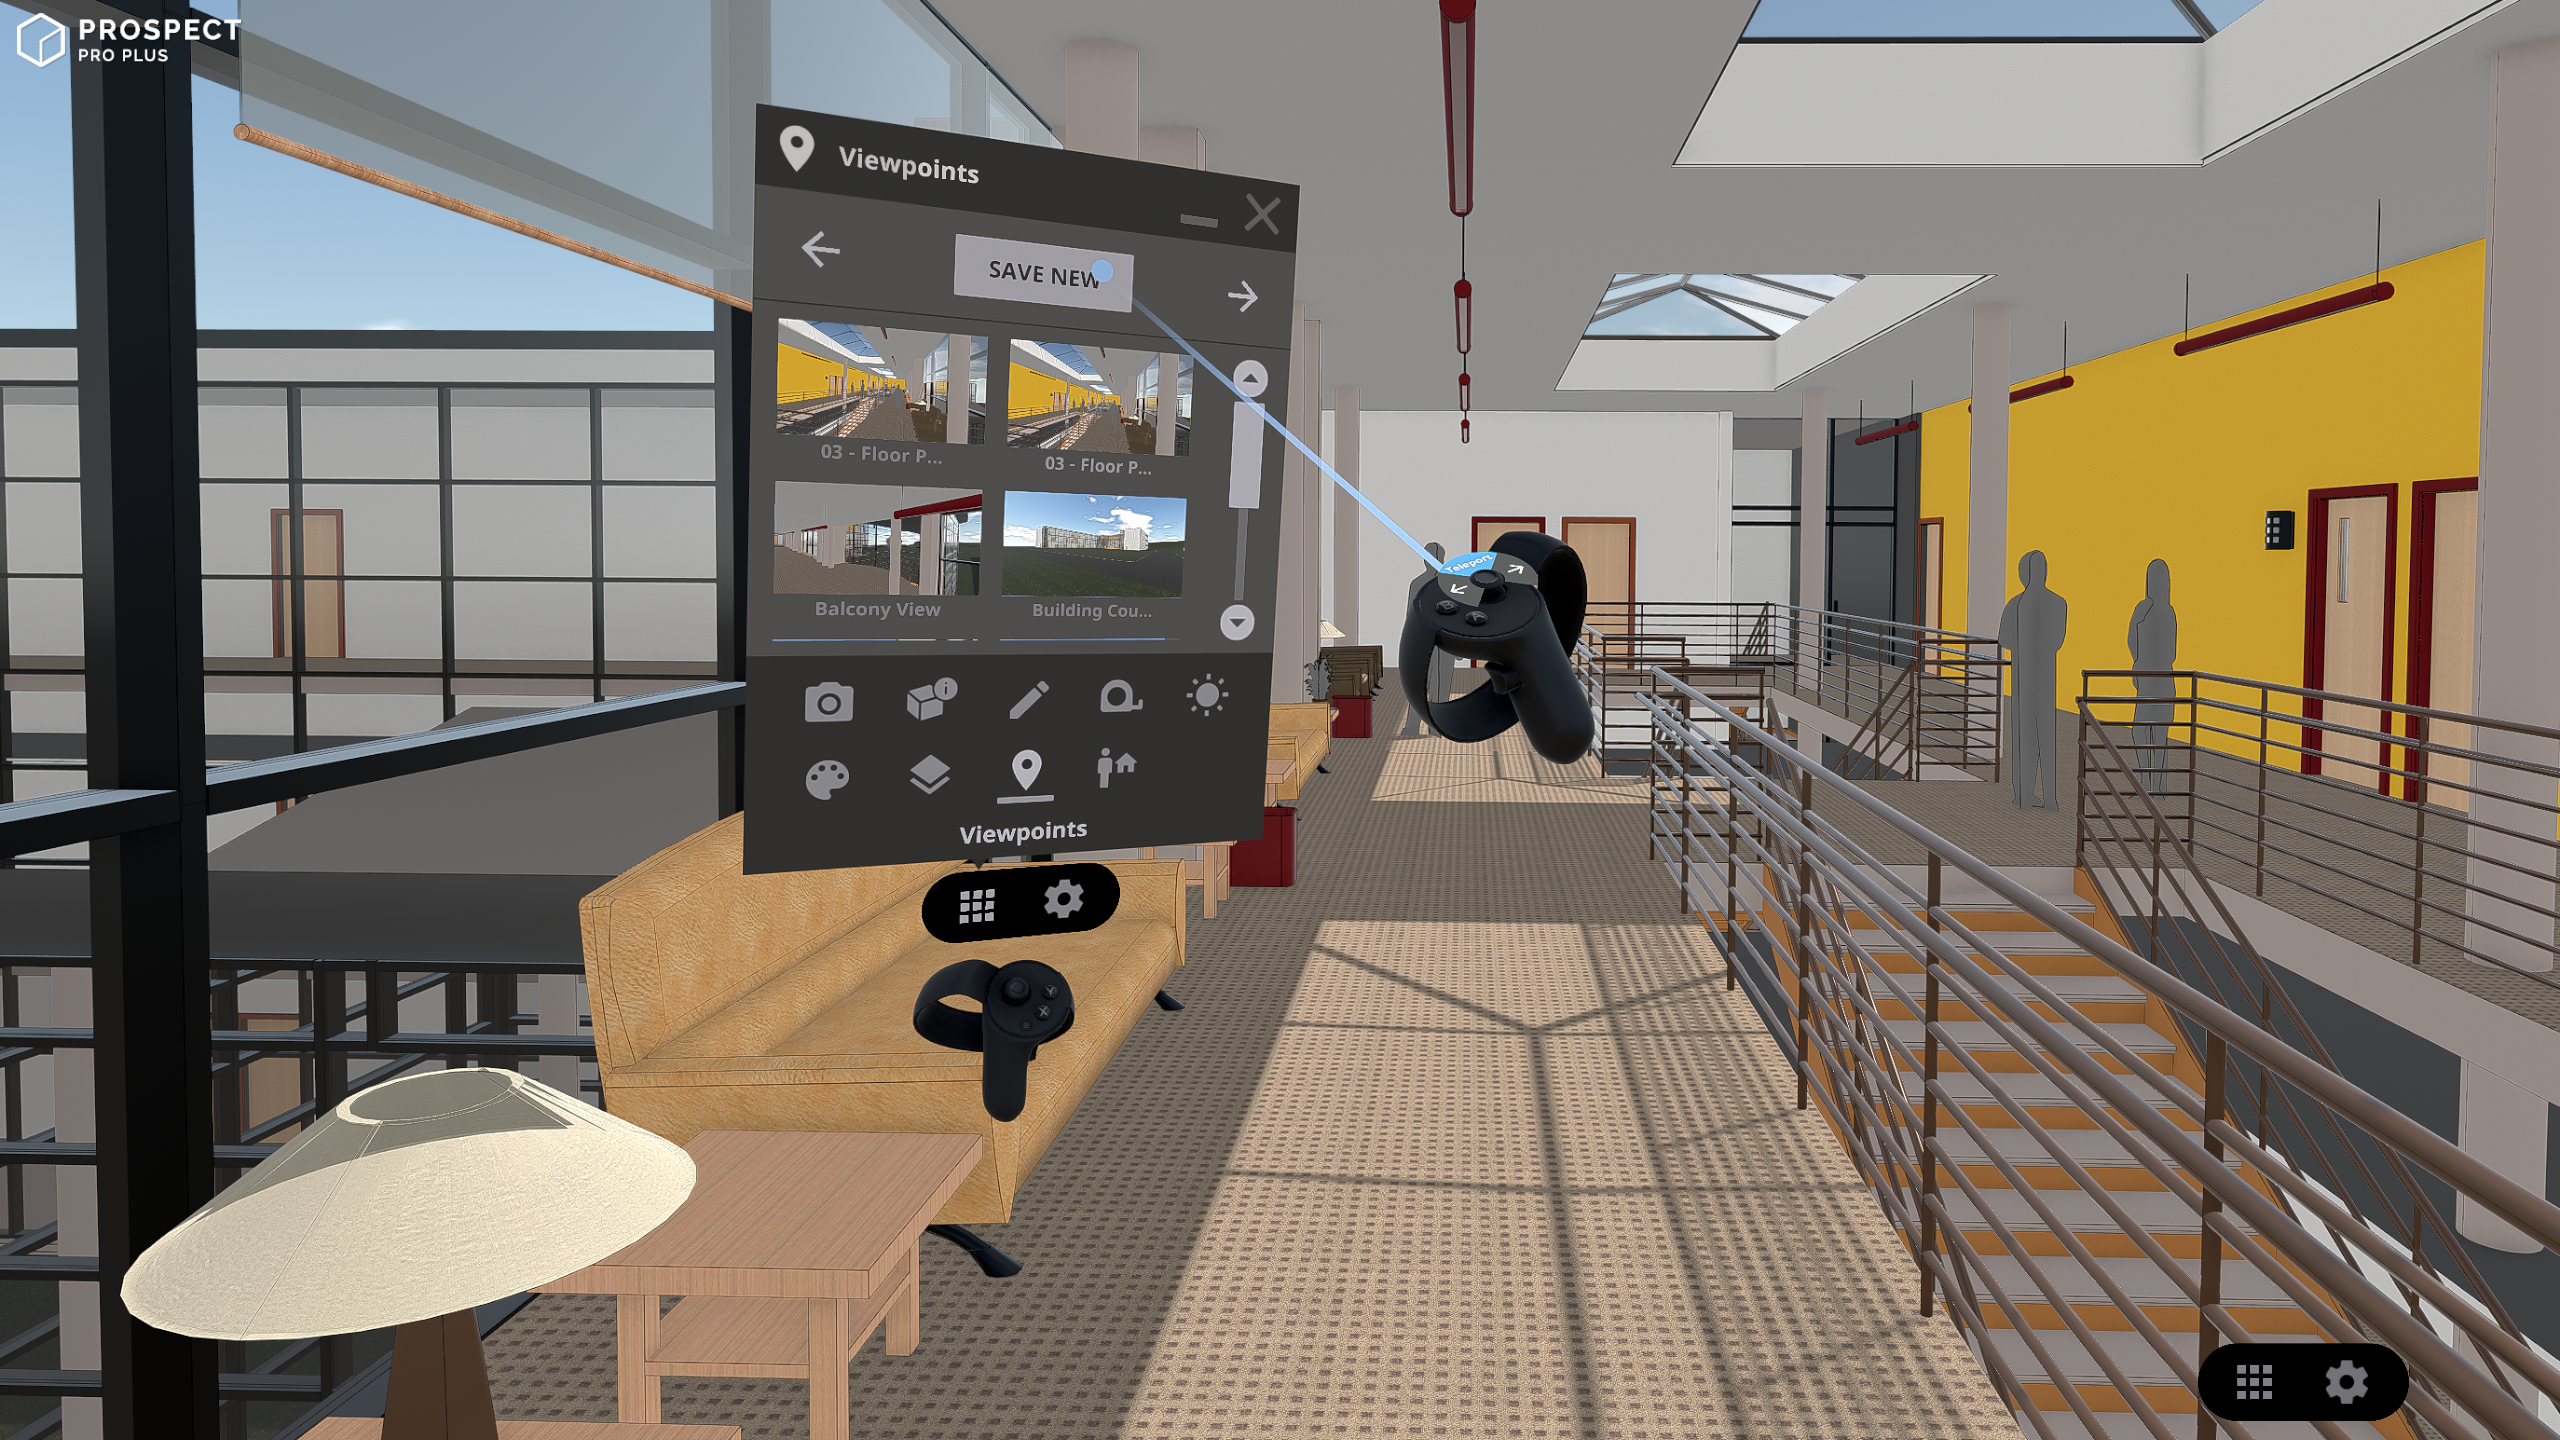 Viewpoint Creation for VR Walkthrough